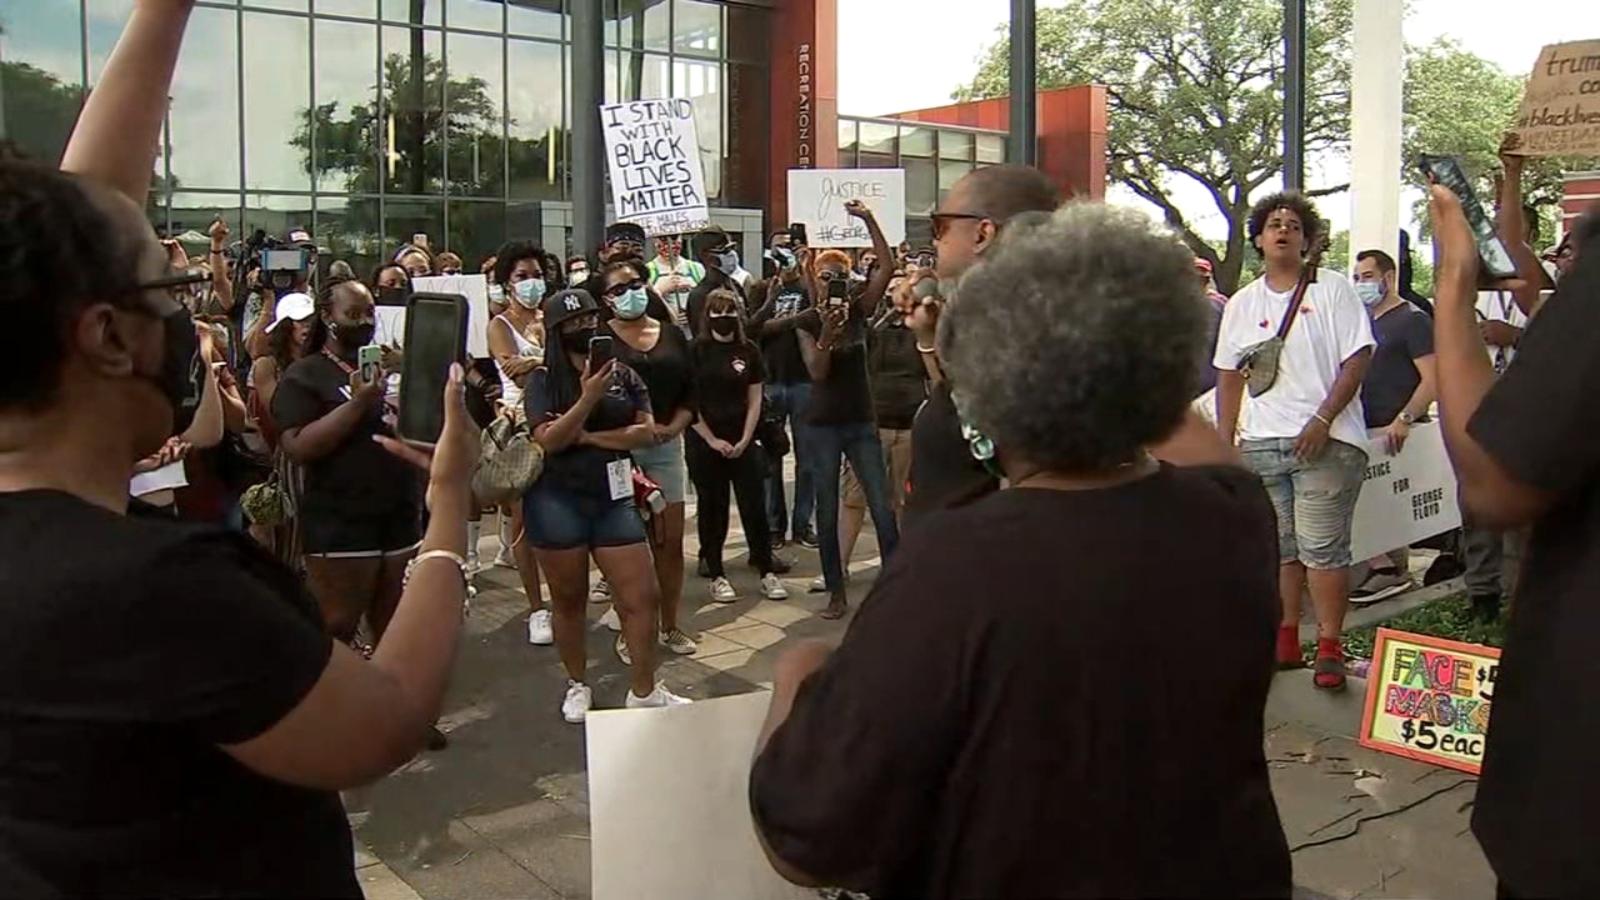 houston protest - photo #23